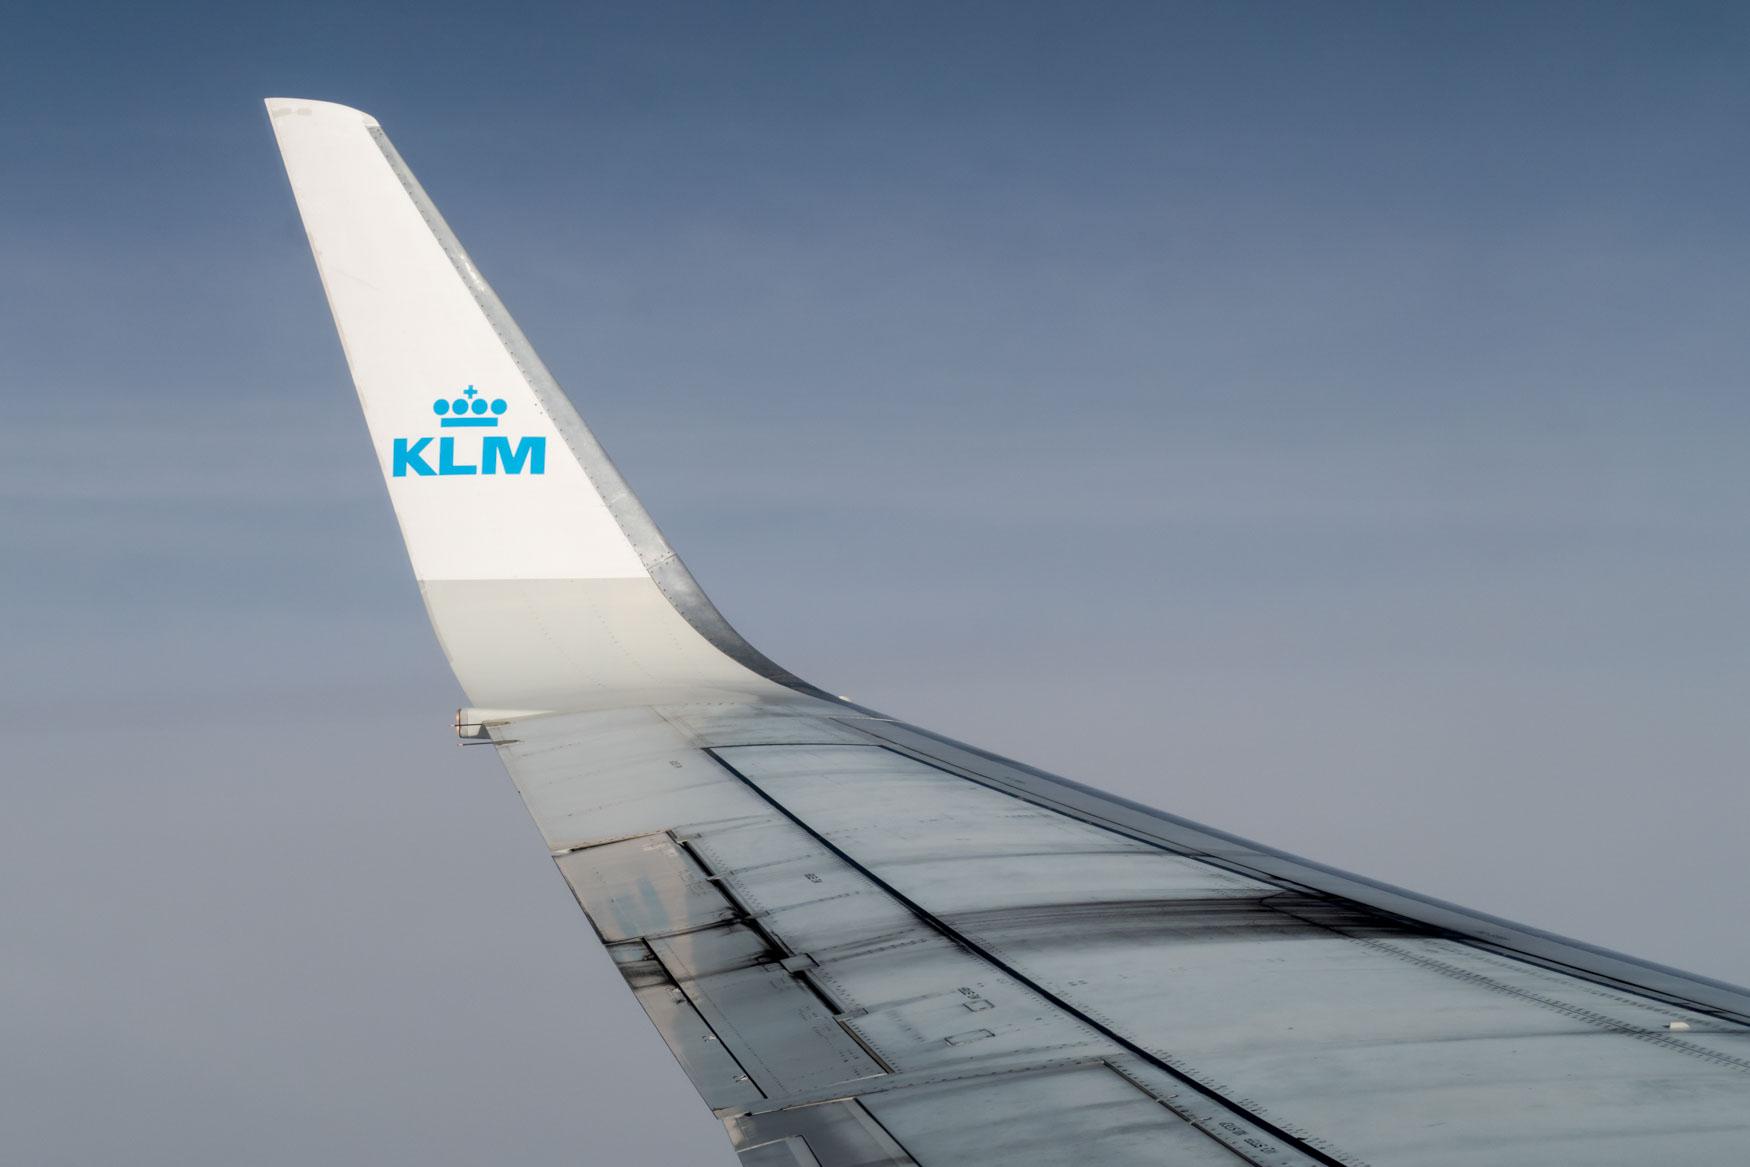 KLM Boeing 737-800 Winglet